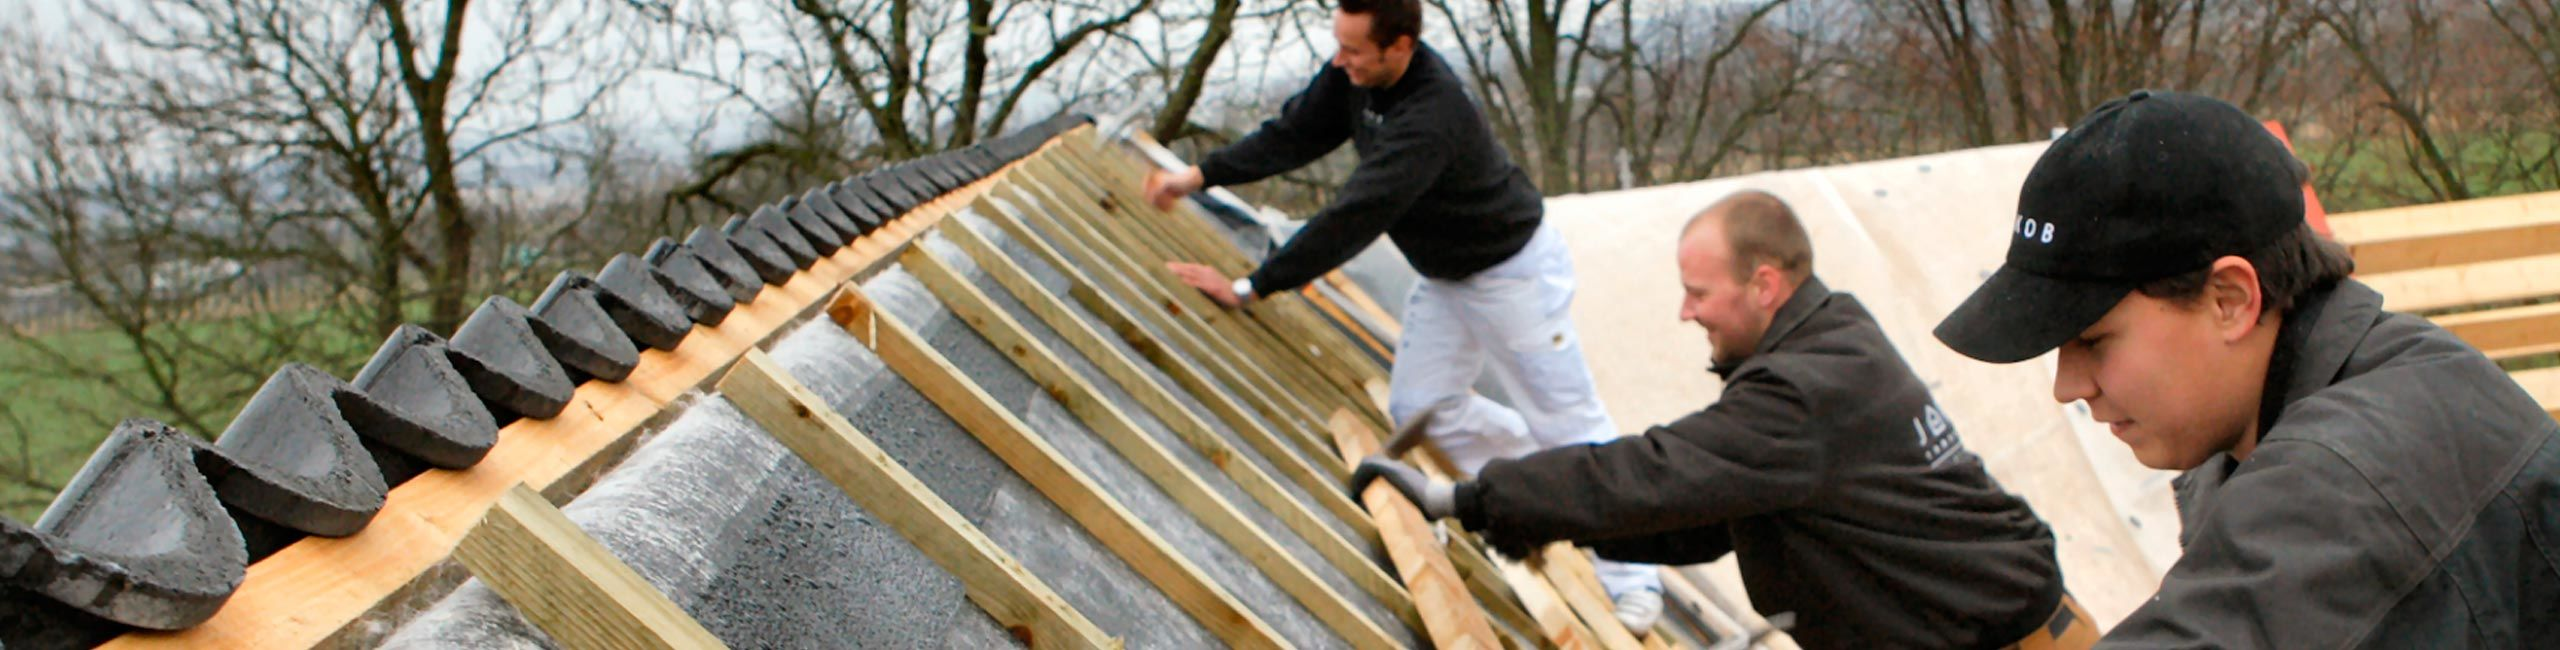 Jakob Tømrerfirma stabilt tømrerfirma med base i det østjyske